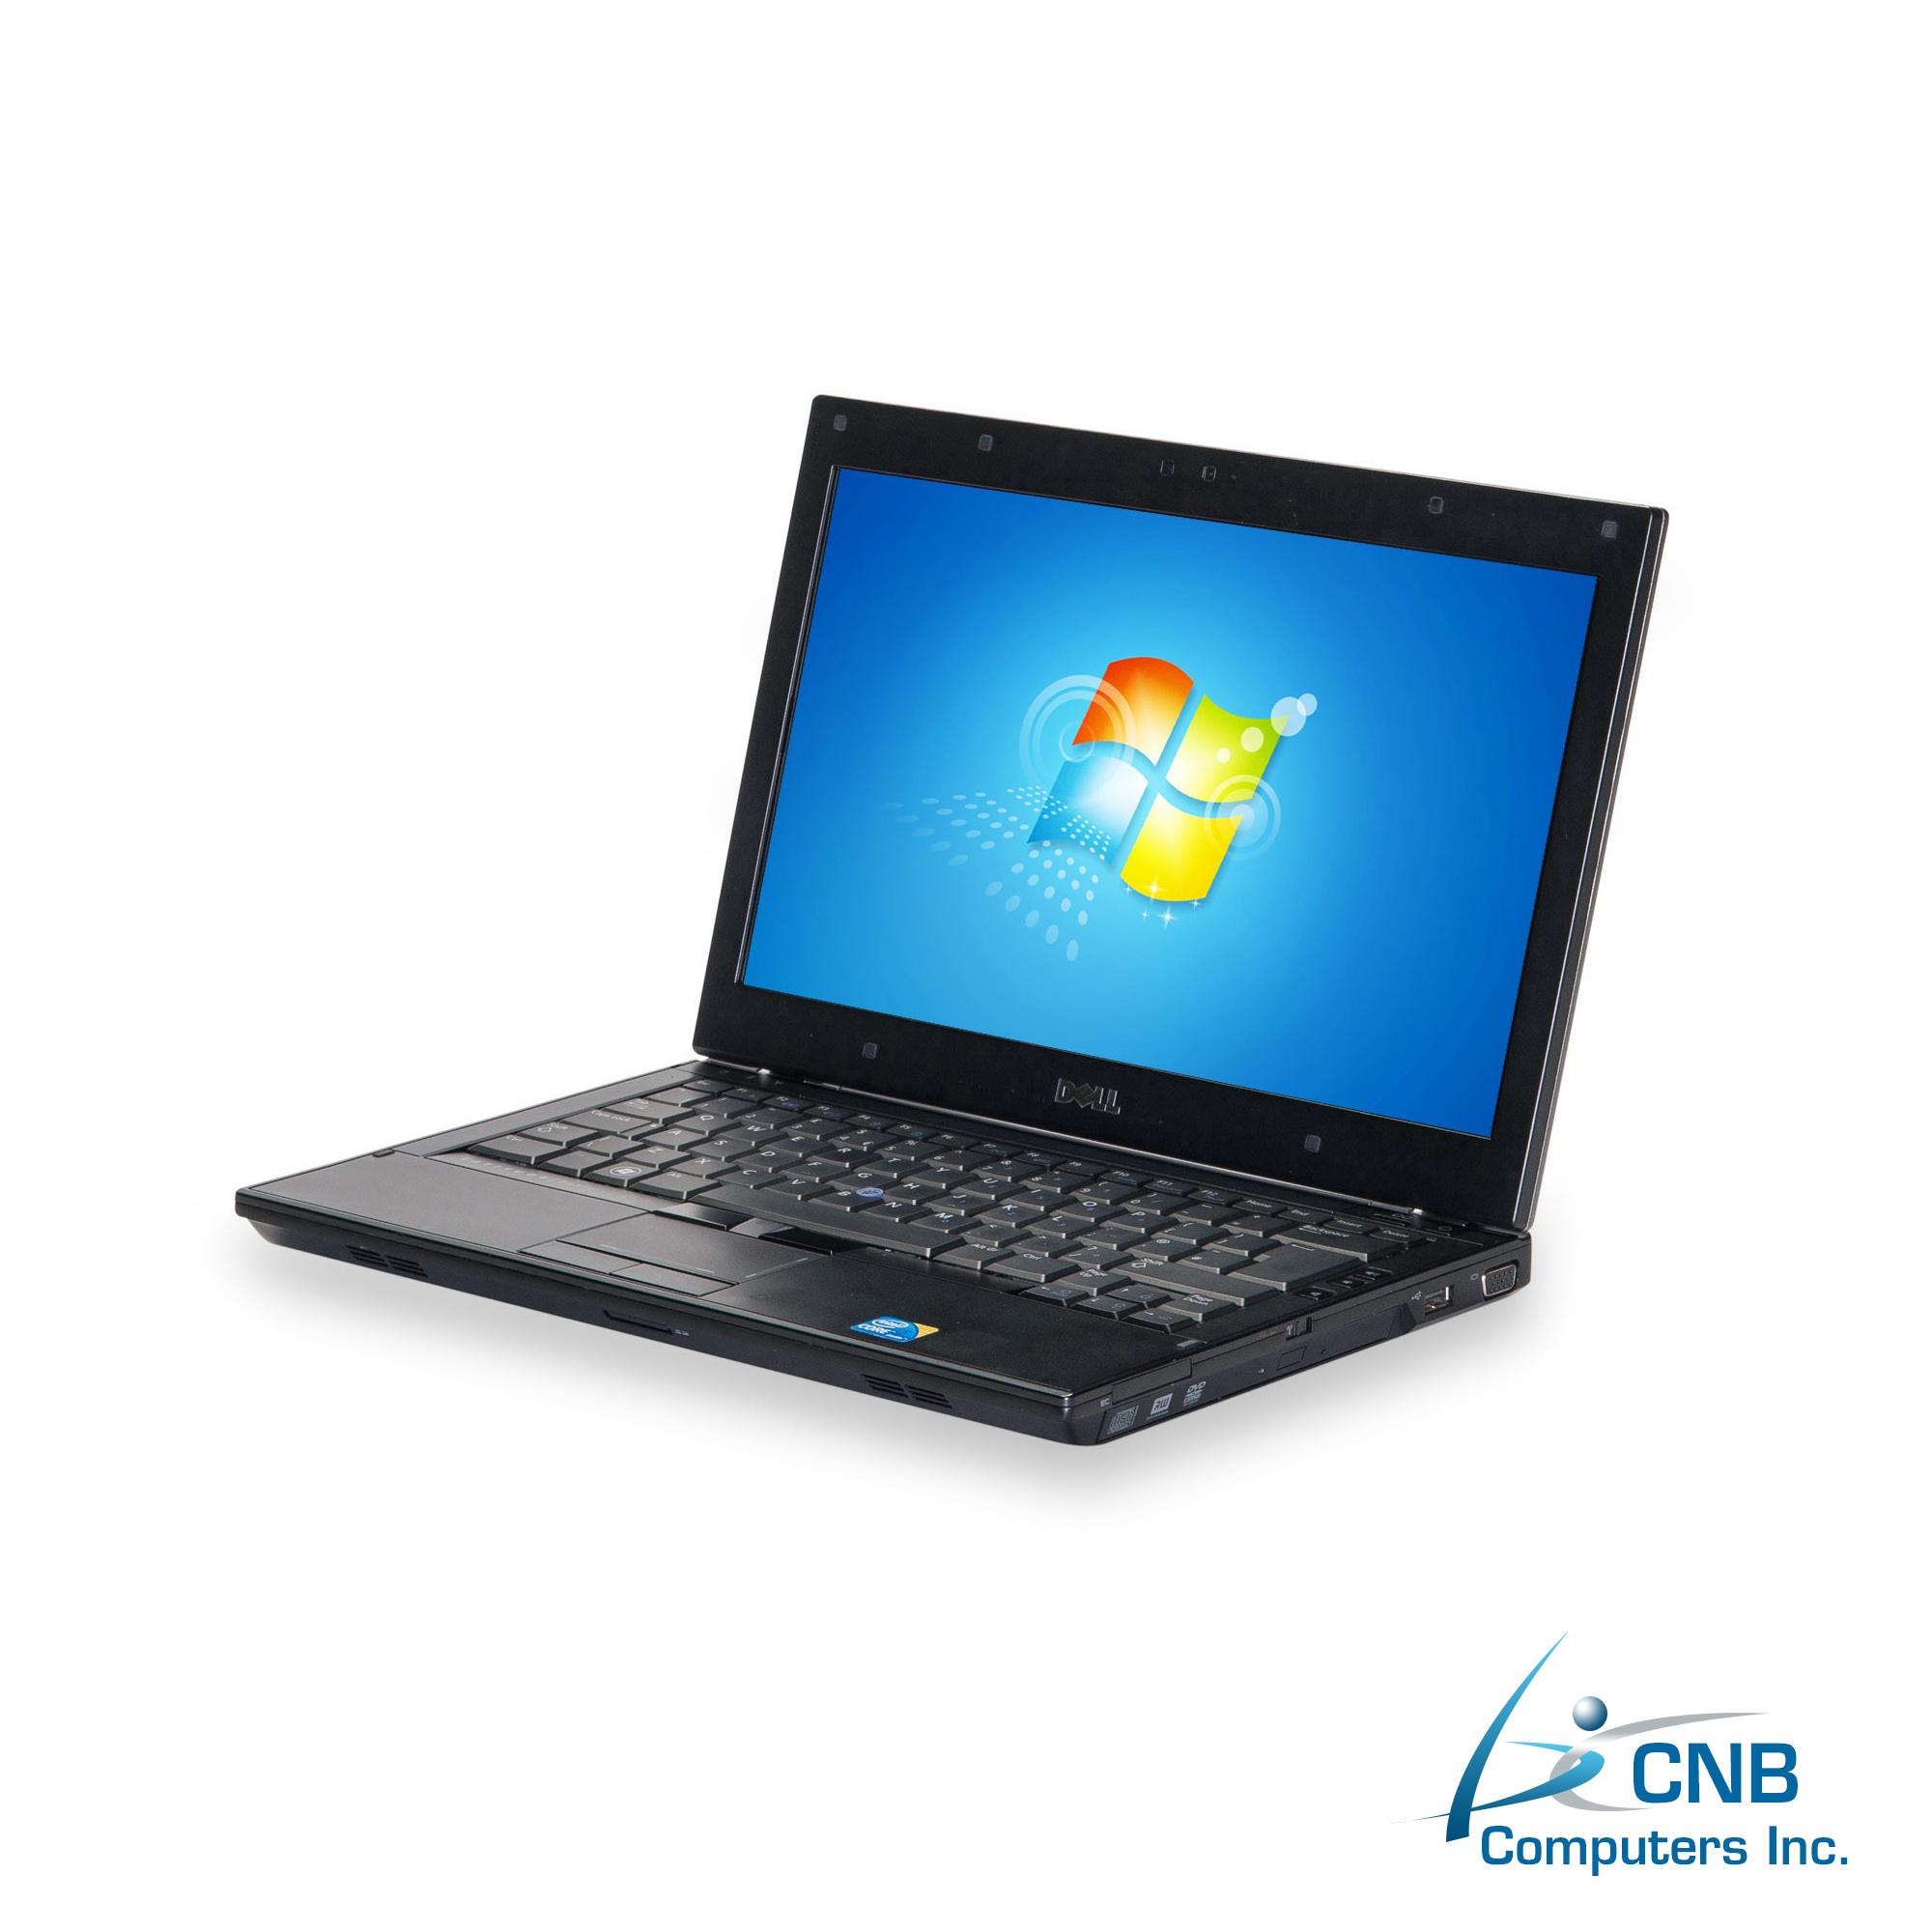 dell latitude e4310 laptop 4gb 160gb hdd intel i5 520m. Black Bedroom Furniture Sets. Home Design Ideas